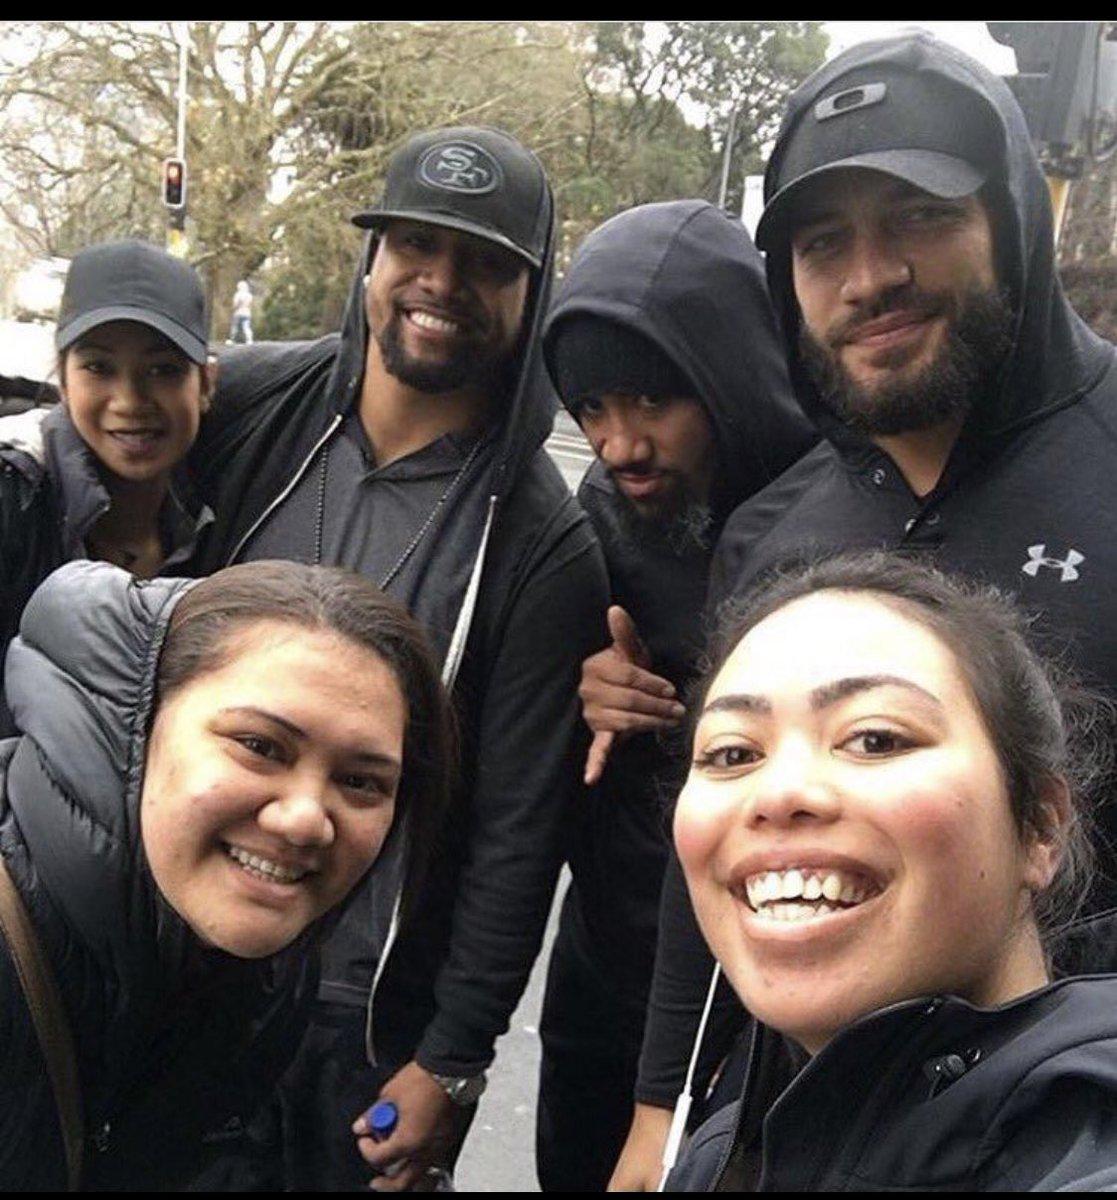 That time #bloodline were in New Zealand 🤧😫 https://t.co/ZLErJqgLhu